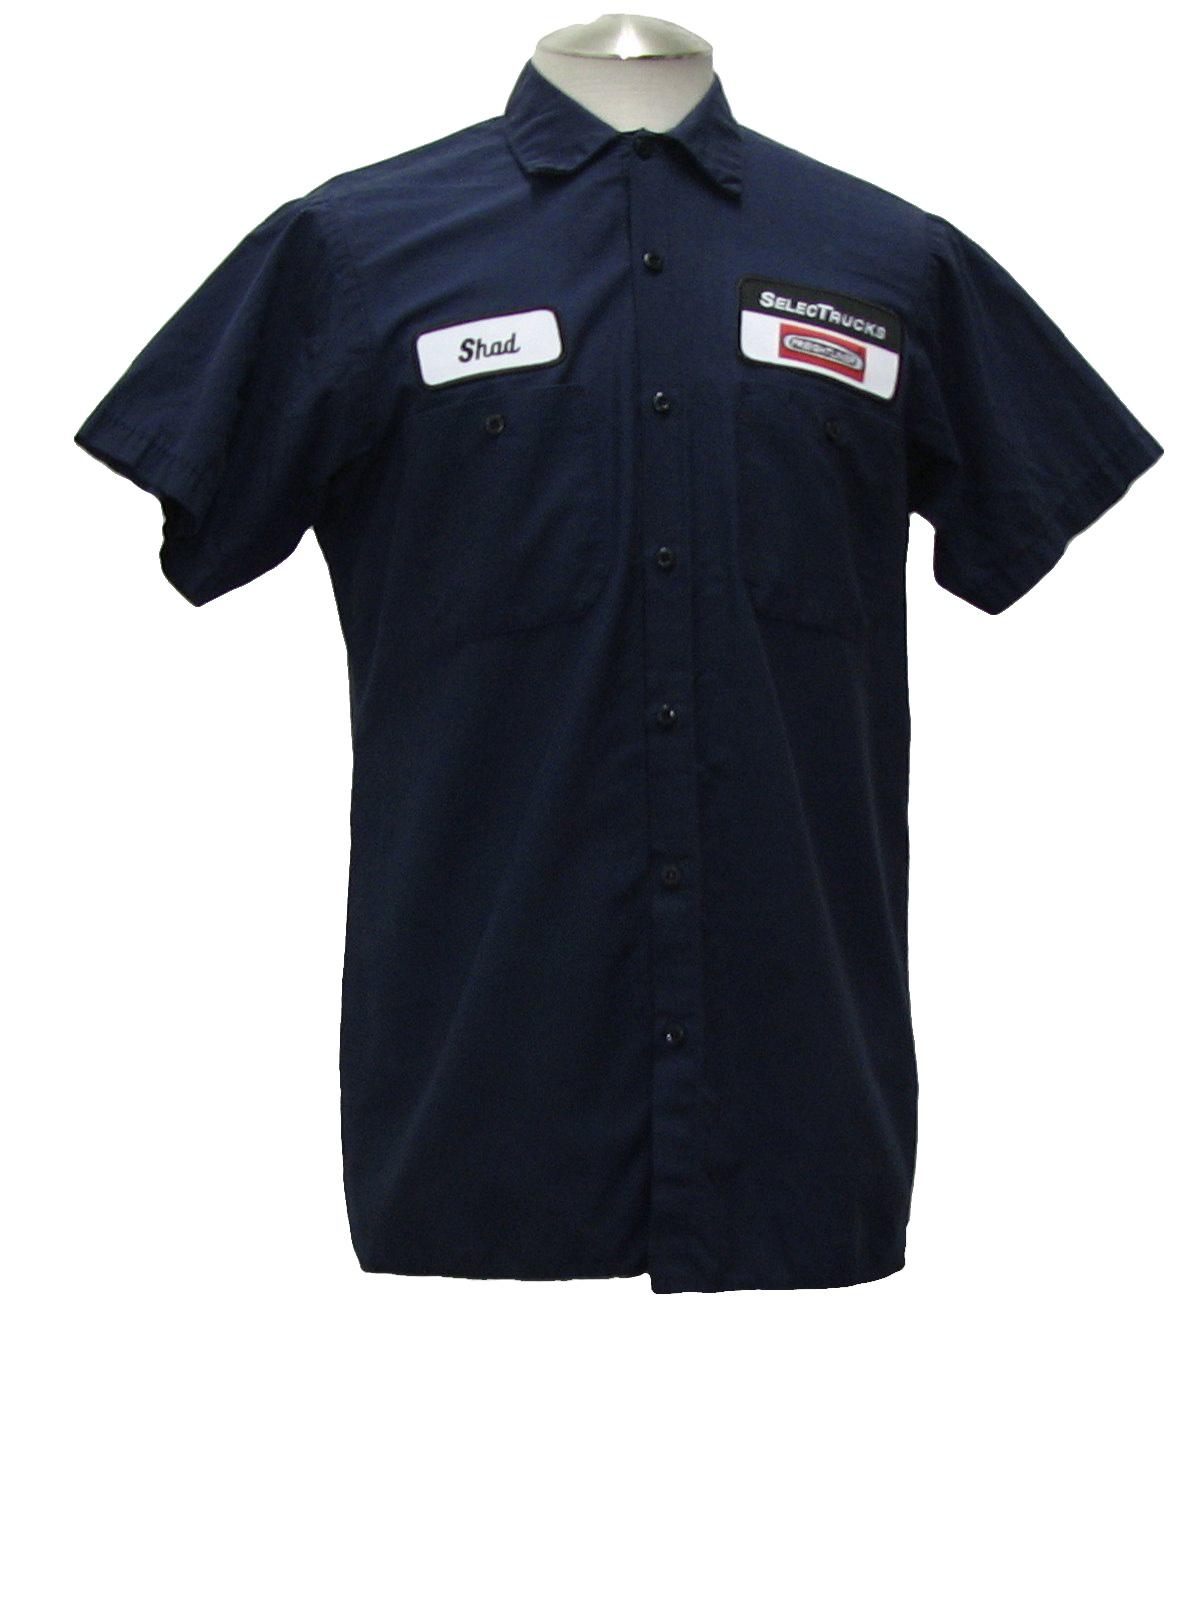 90s Shirt Cintas 90s Cintas Mens Navy Blue Cotton